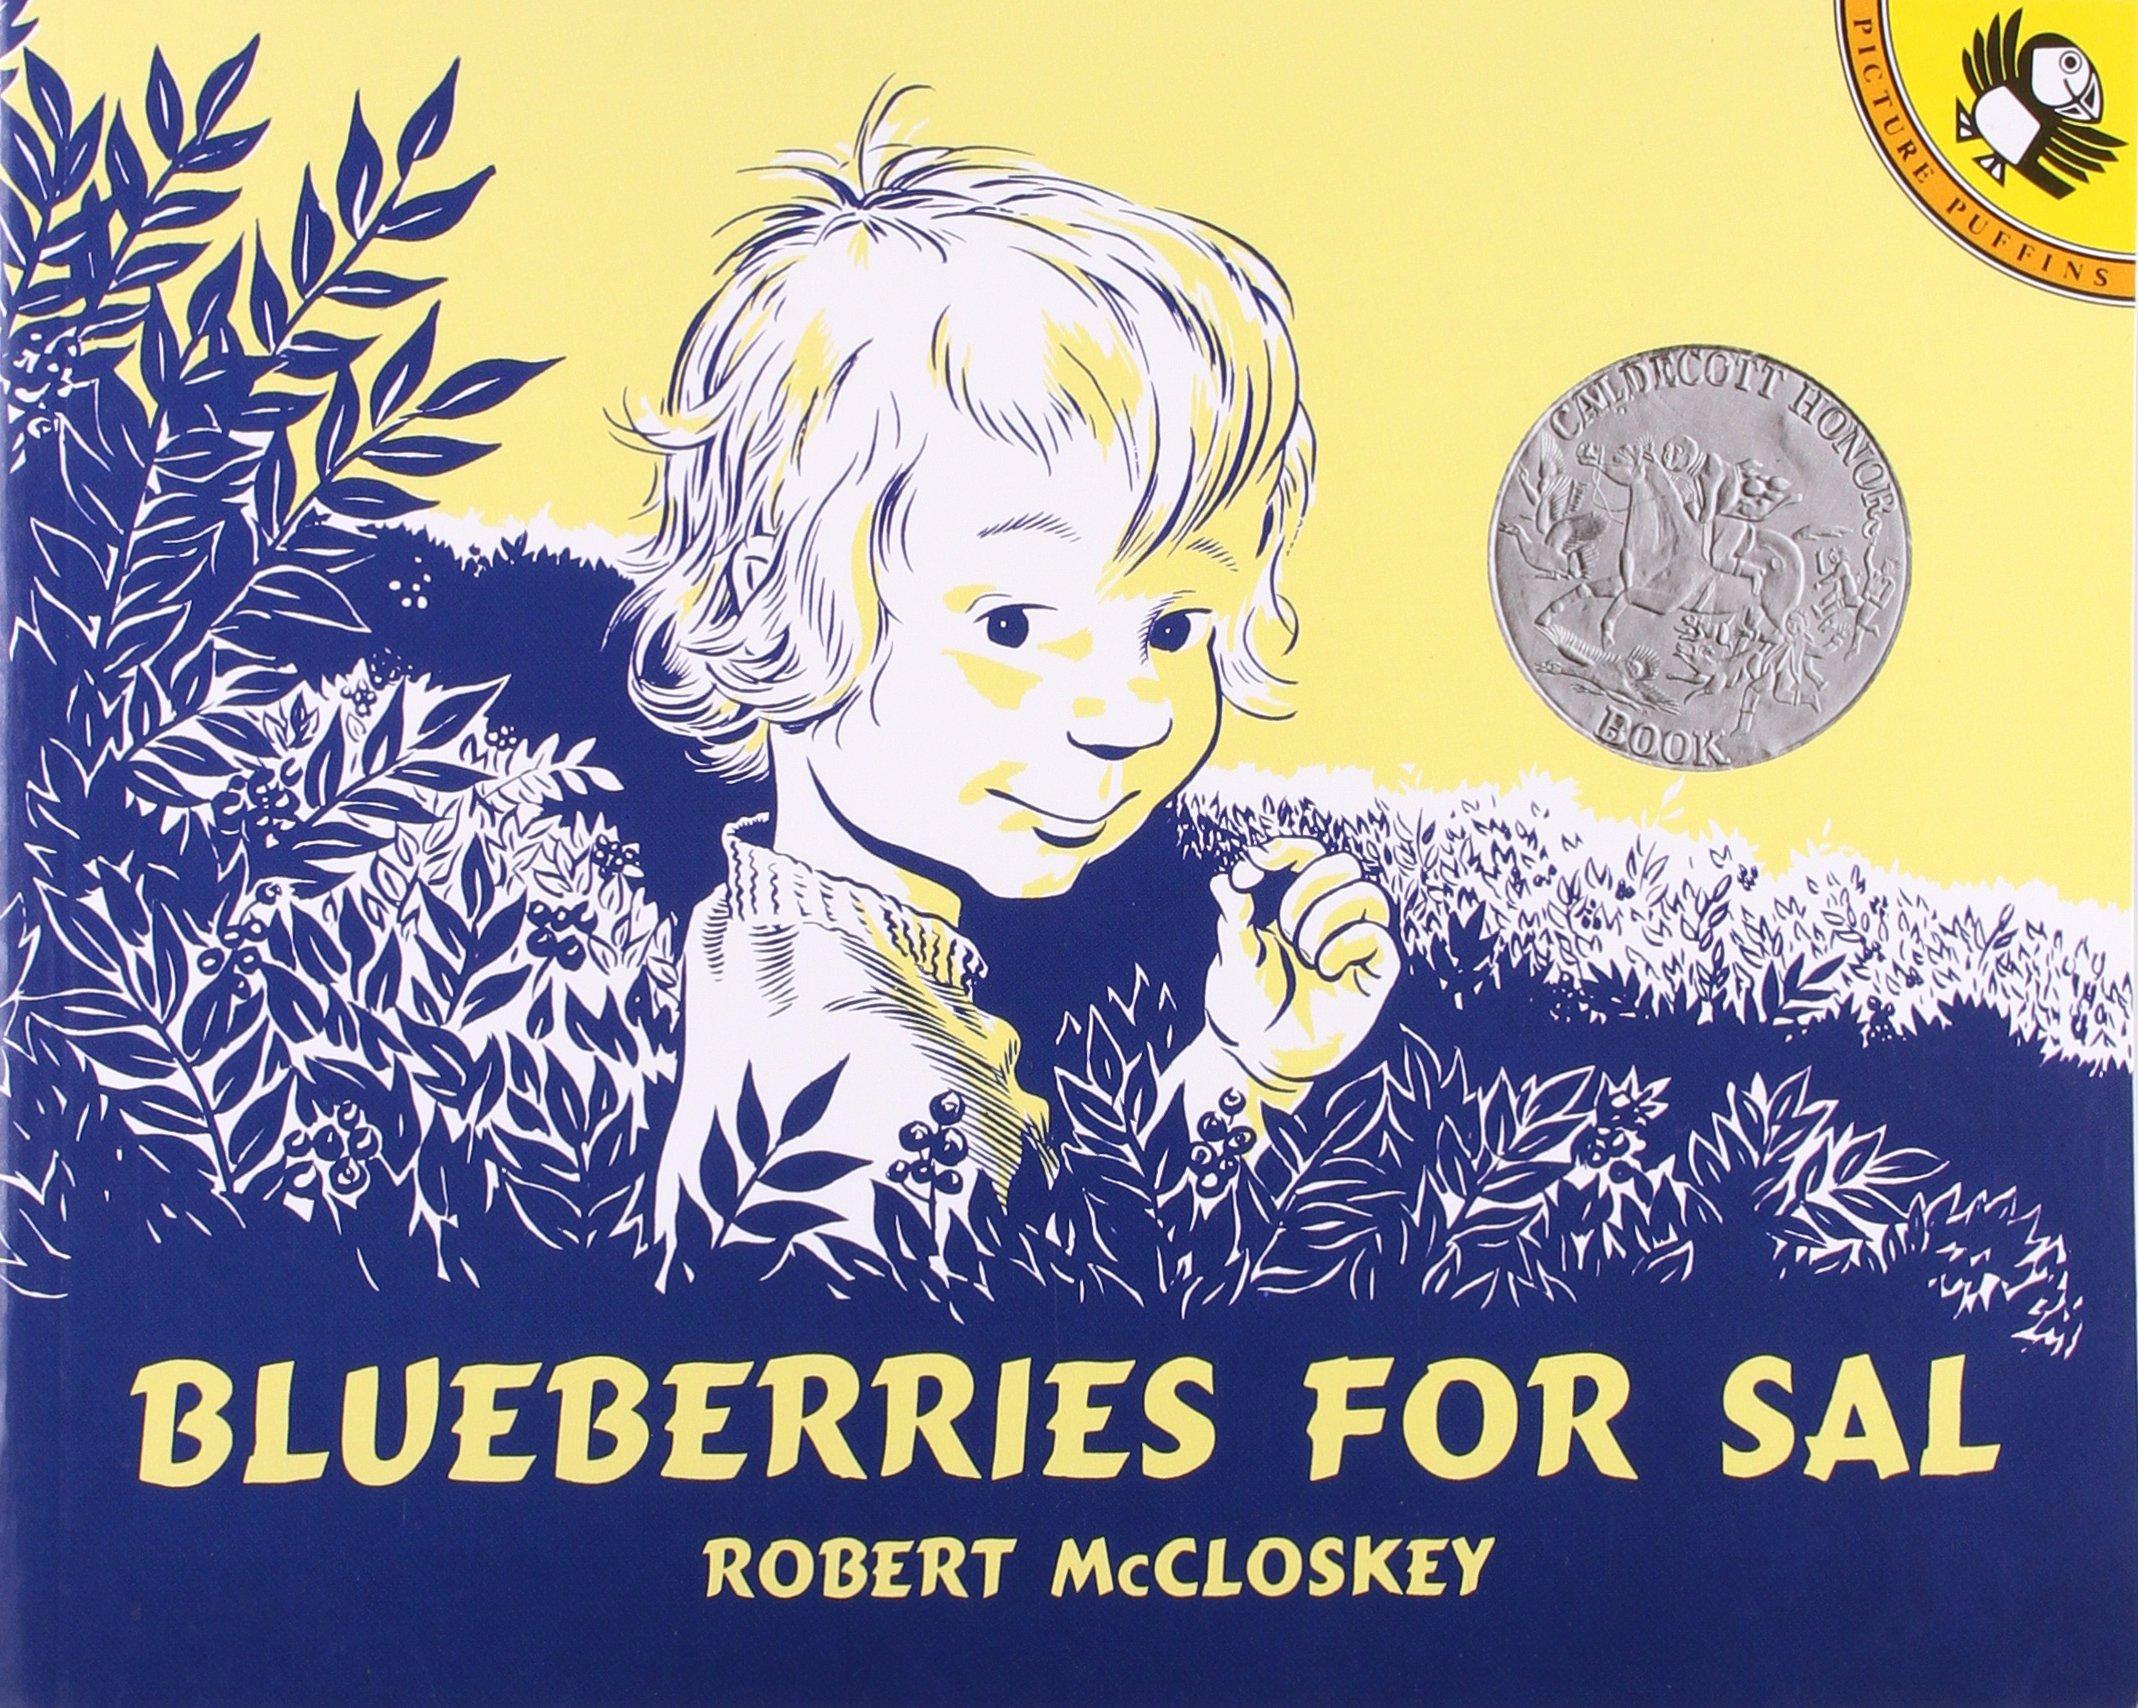 Classic Children S Book Cover ~ Staff picks: favorite childrens books u2013 campbell county public